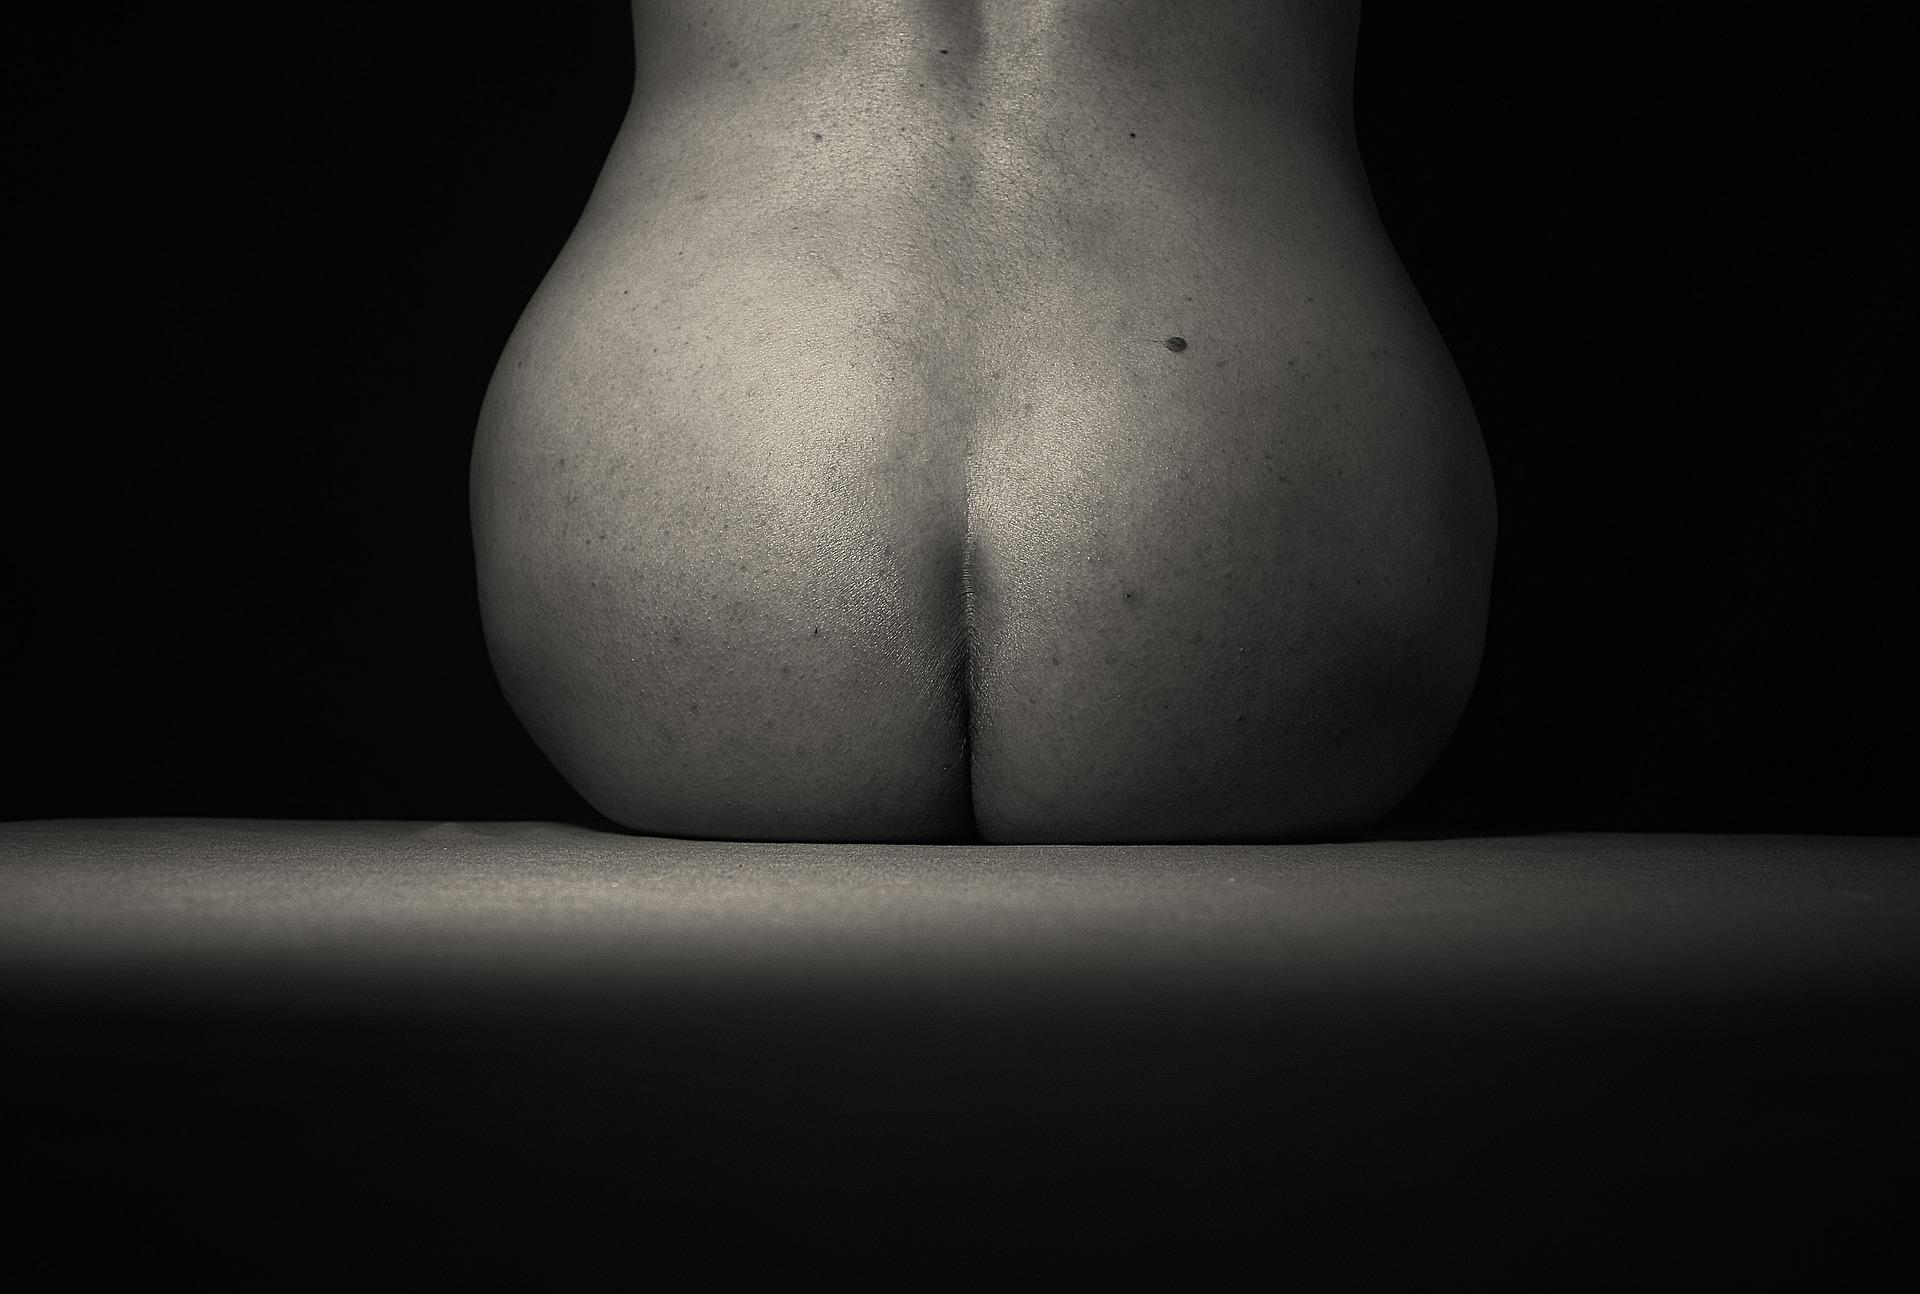 curves-5262331_1920